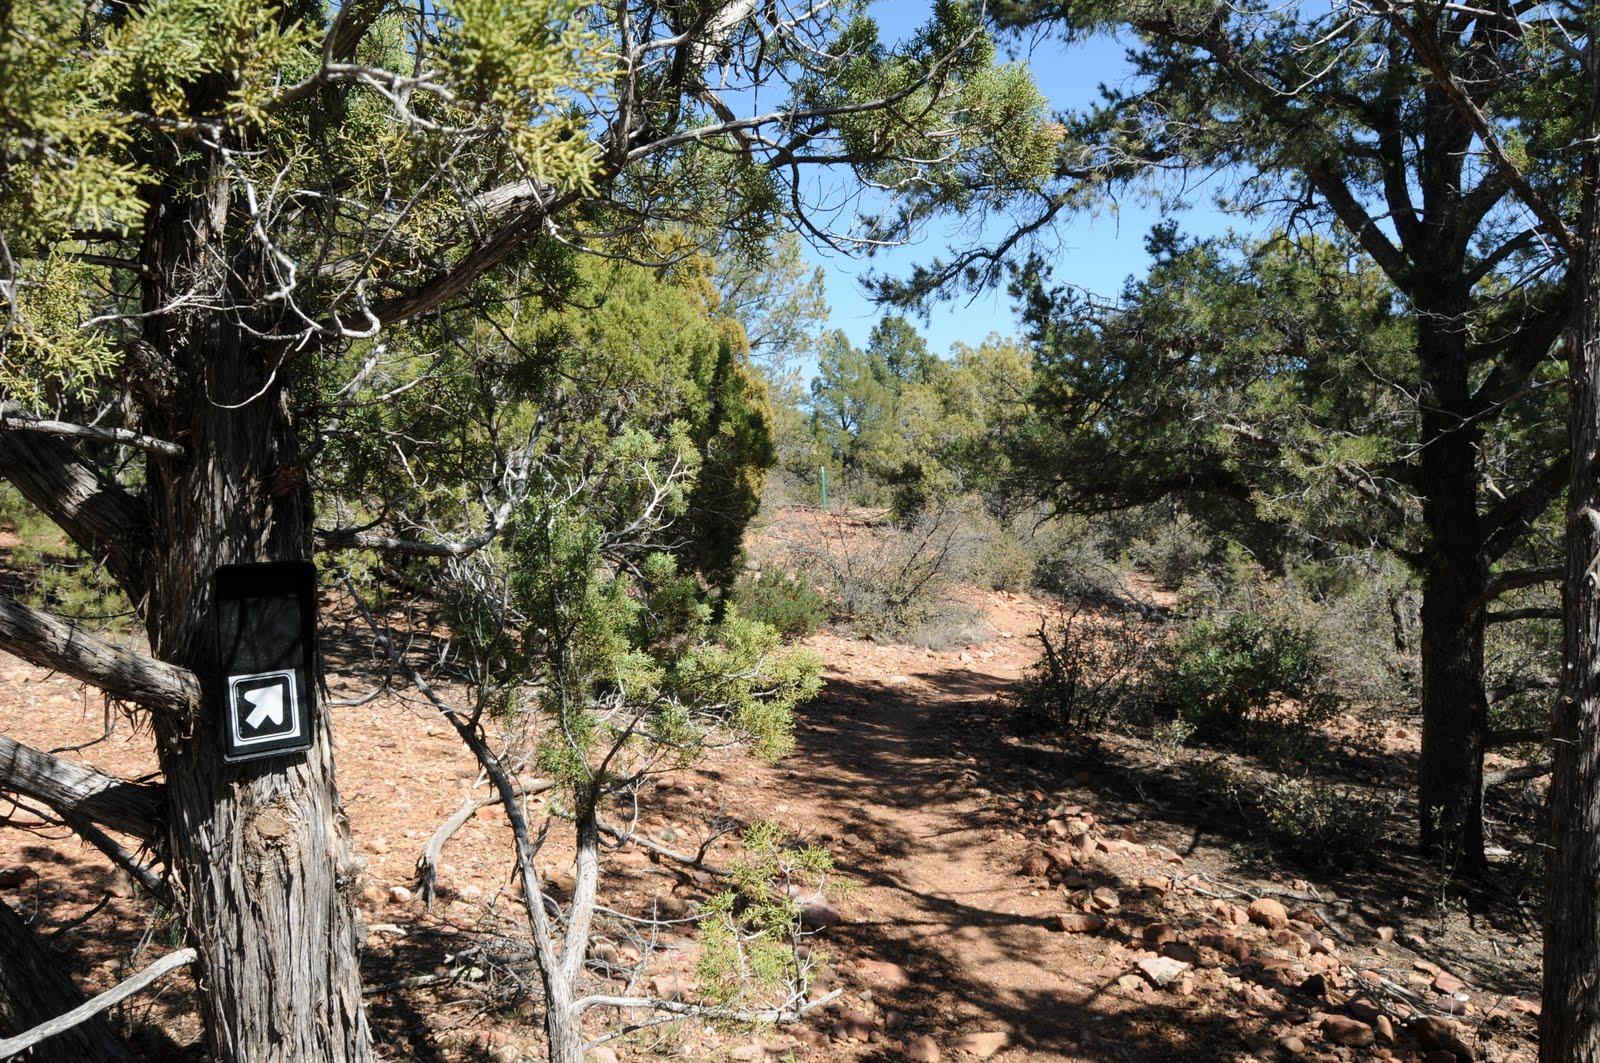 Arizona Hiking: GOAT CAMP RUINS